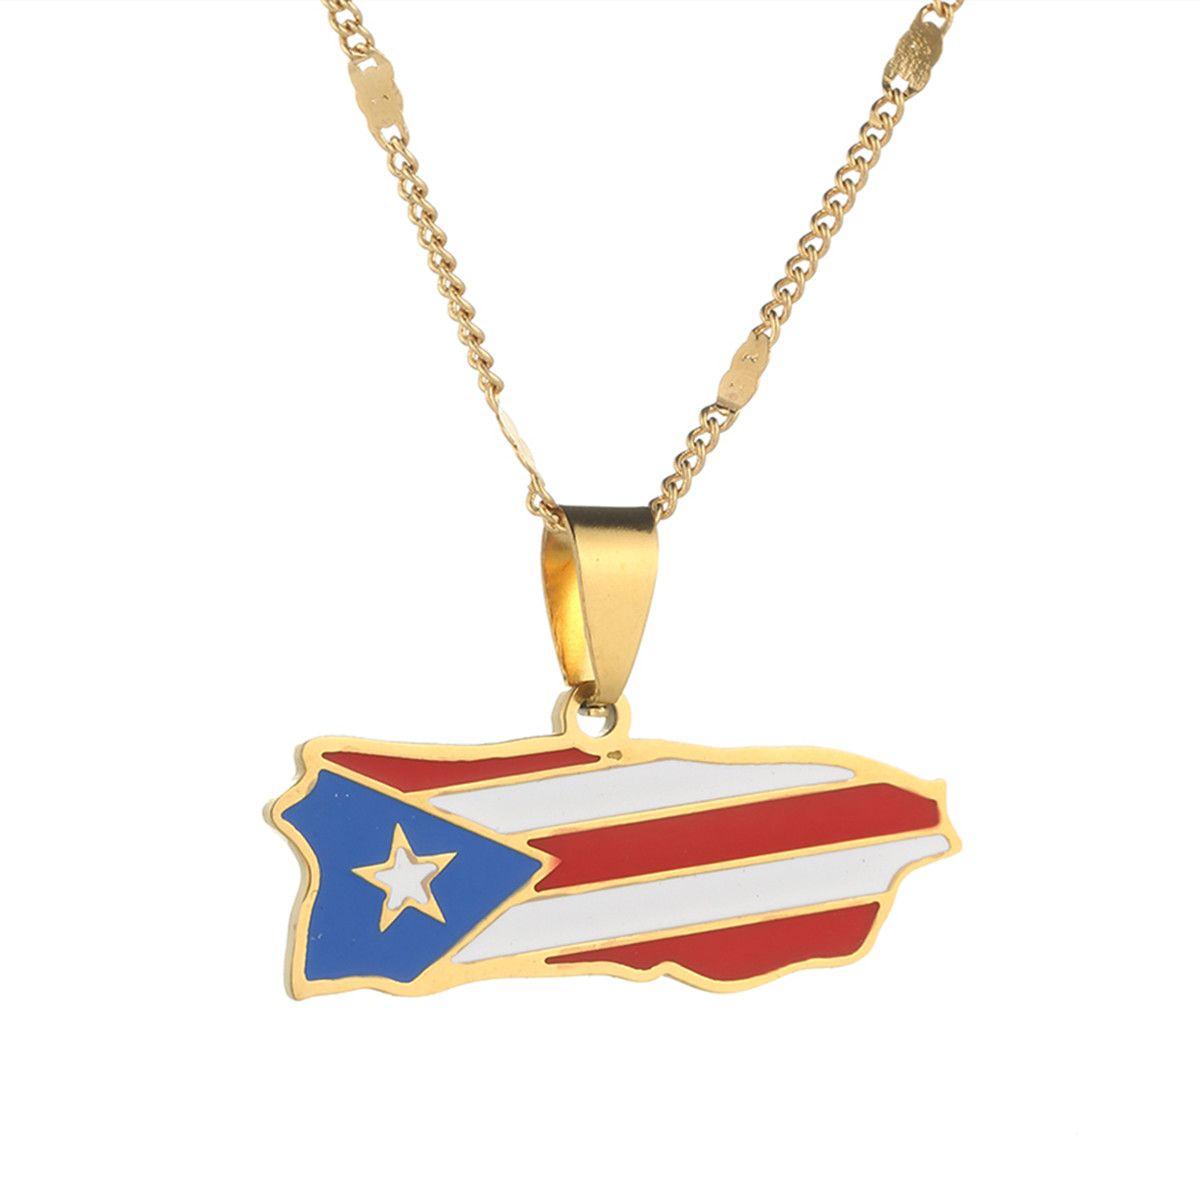 Puerto Rico map pendant Puerto Rico necklace Puerto Rico pendant Puerto Rico jewelry Puerto Rico key chain key ring key fob